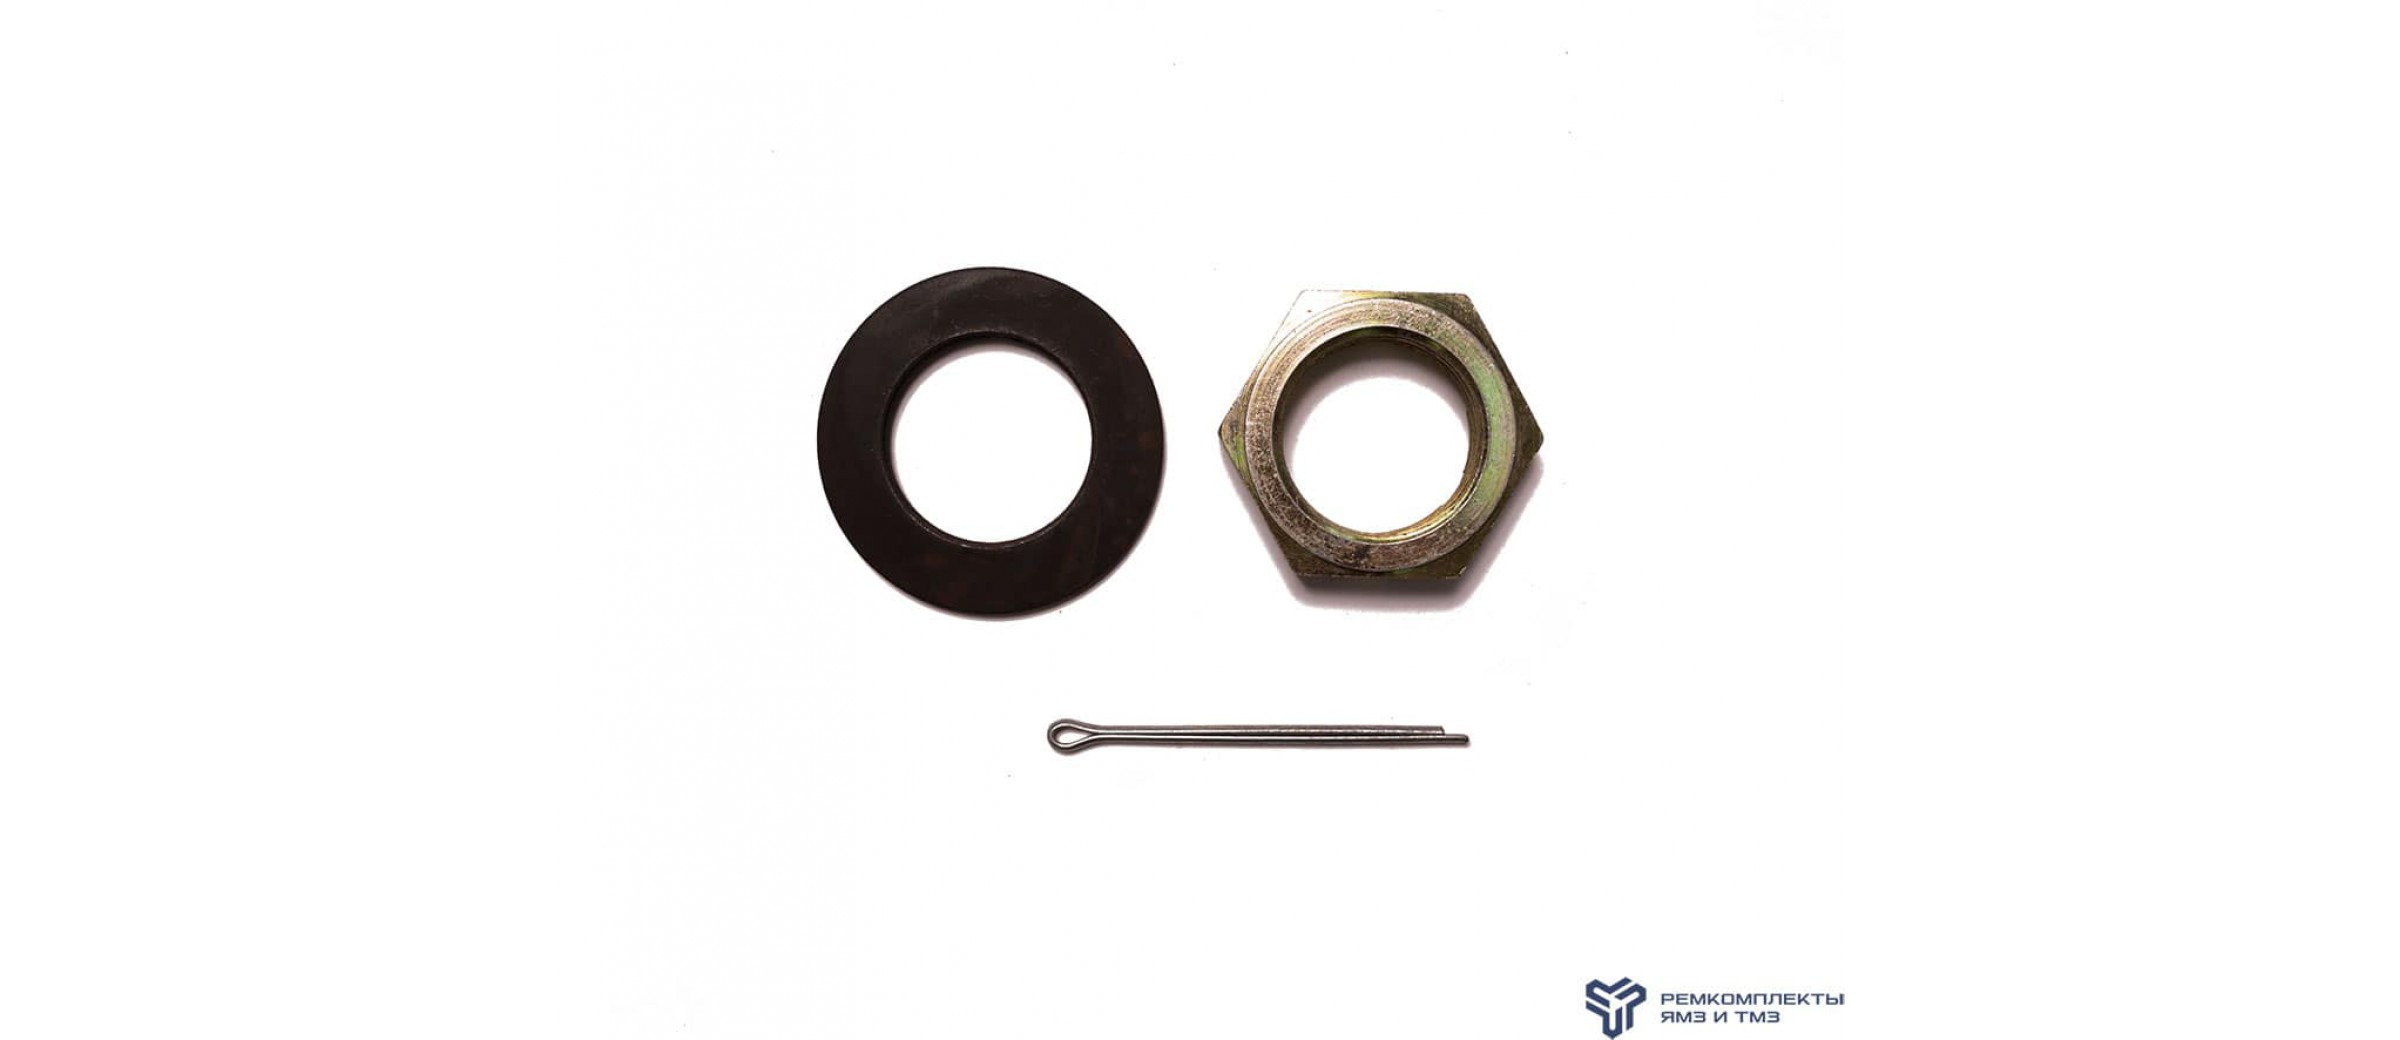 Ремкомплект крепления фланца кардана (КПП-236)